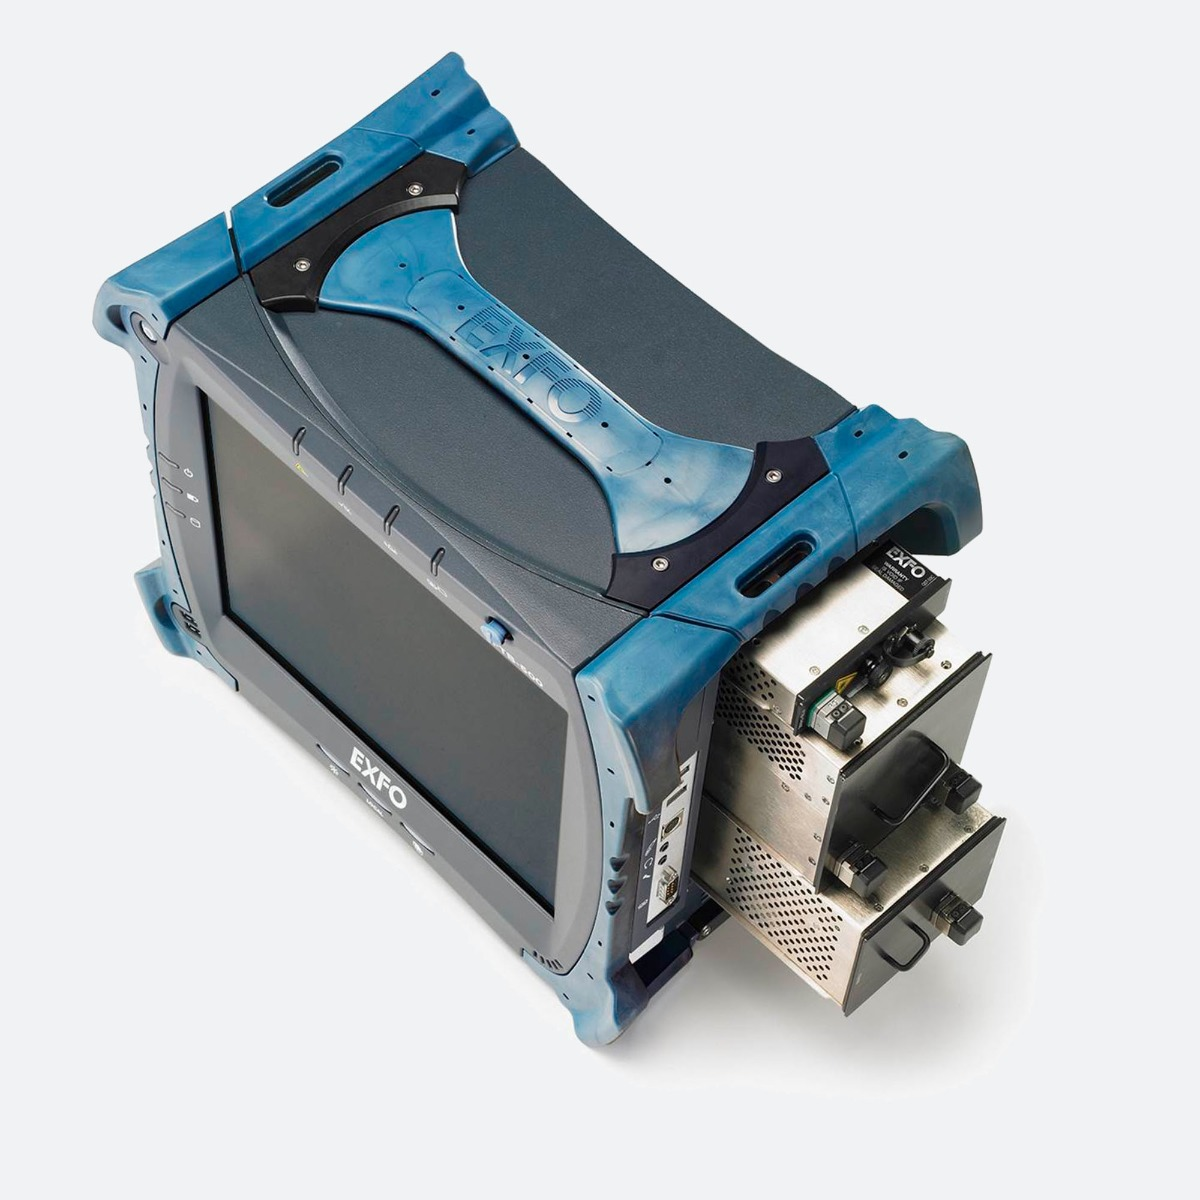 EXFO FTB-500 - platform